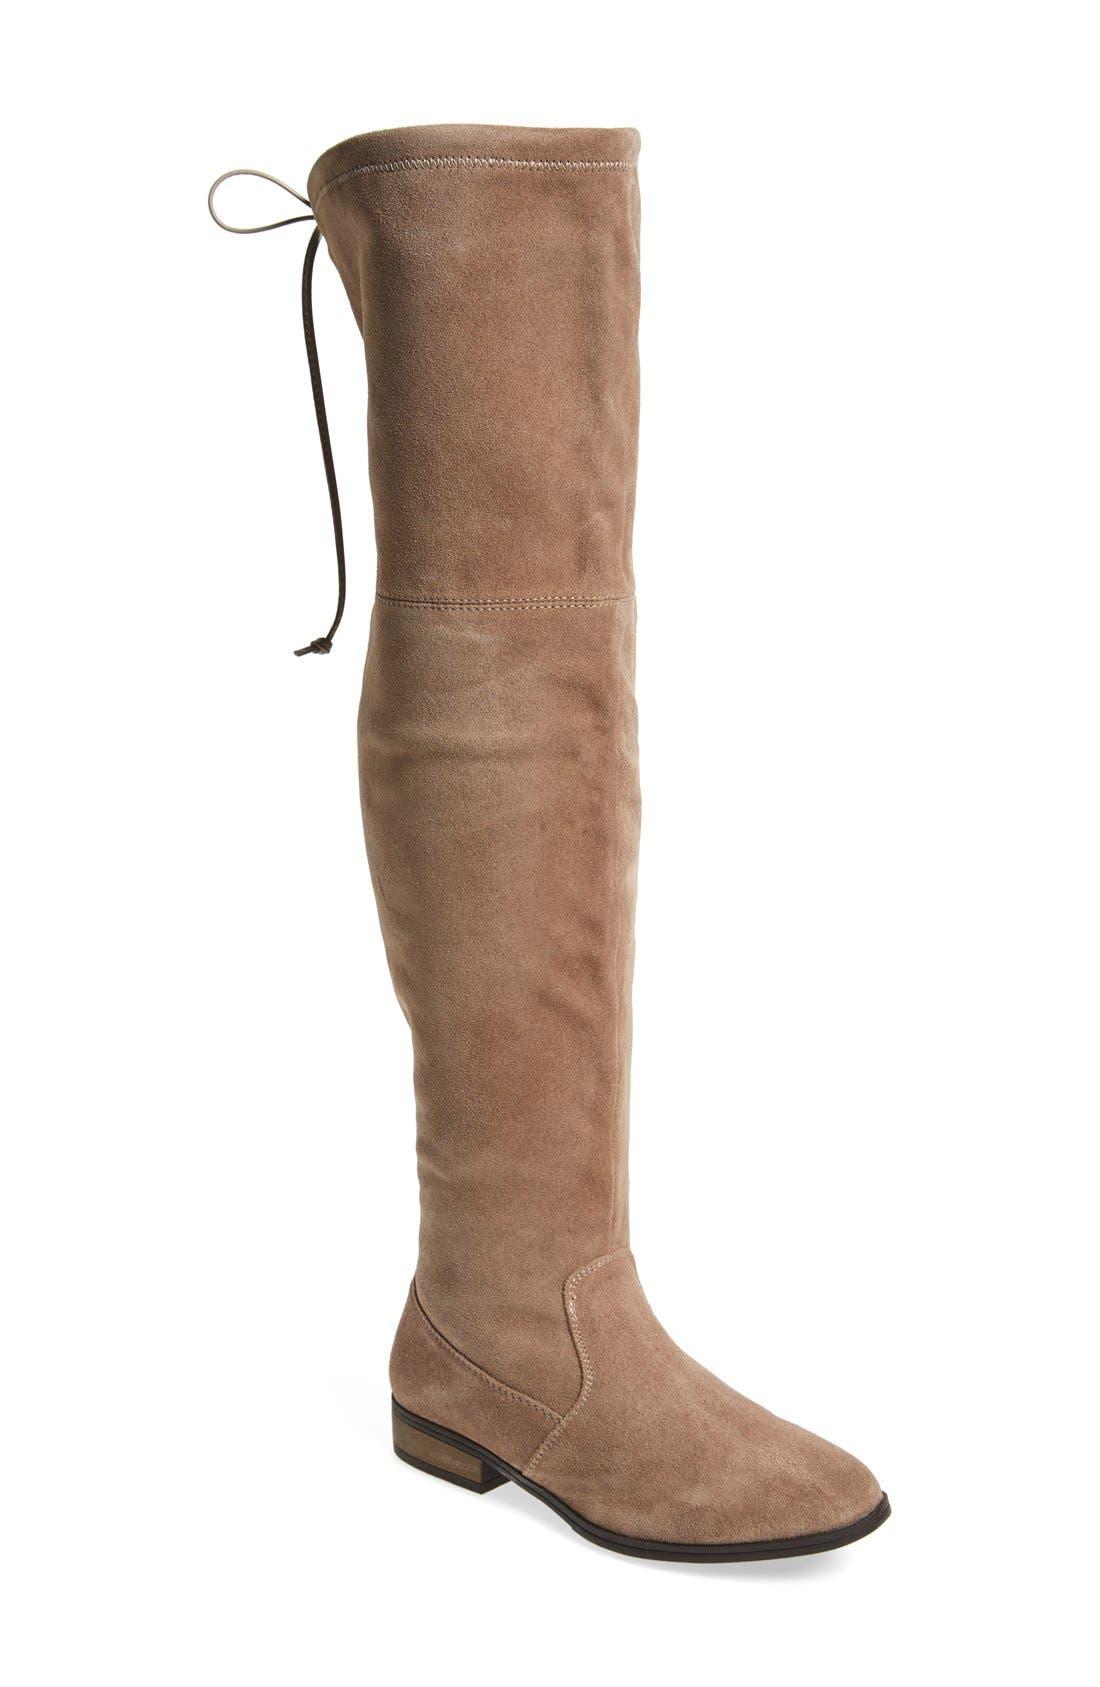 Main Image - Sole Society 'Valencia' Over the Knee Boot (Women)